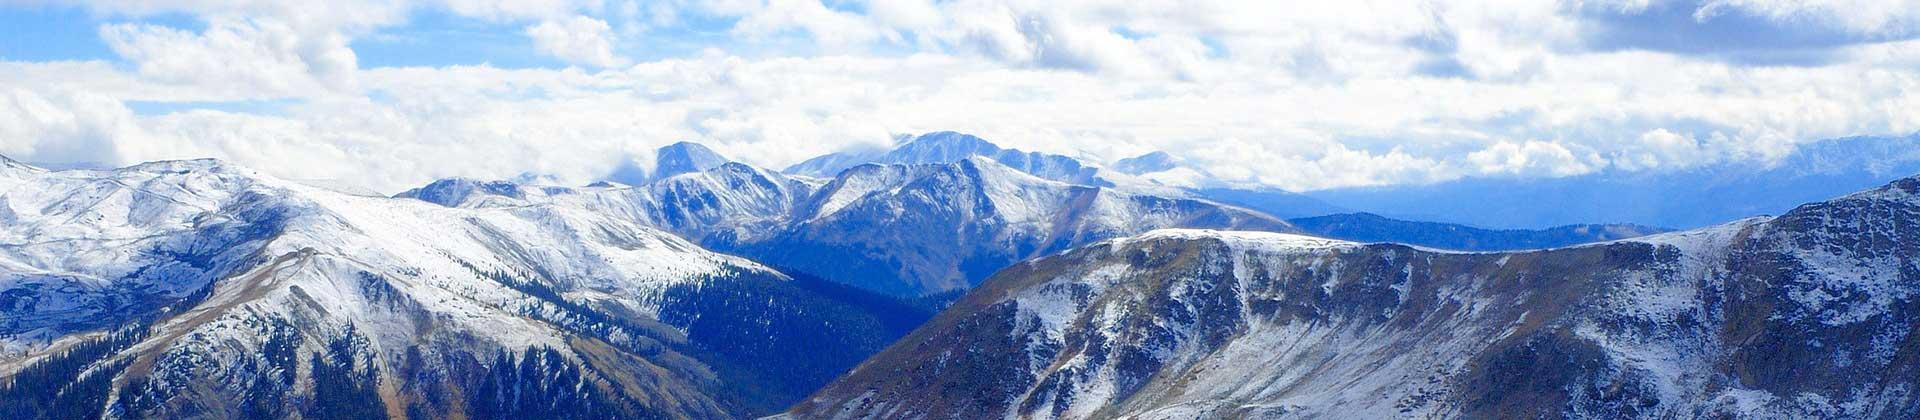 High Mountains of Pakistan